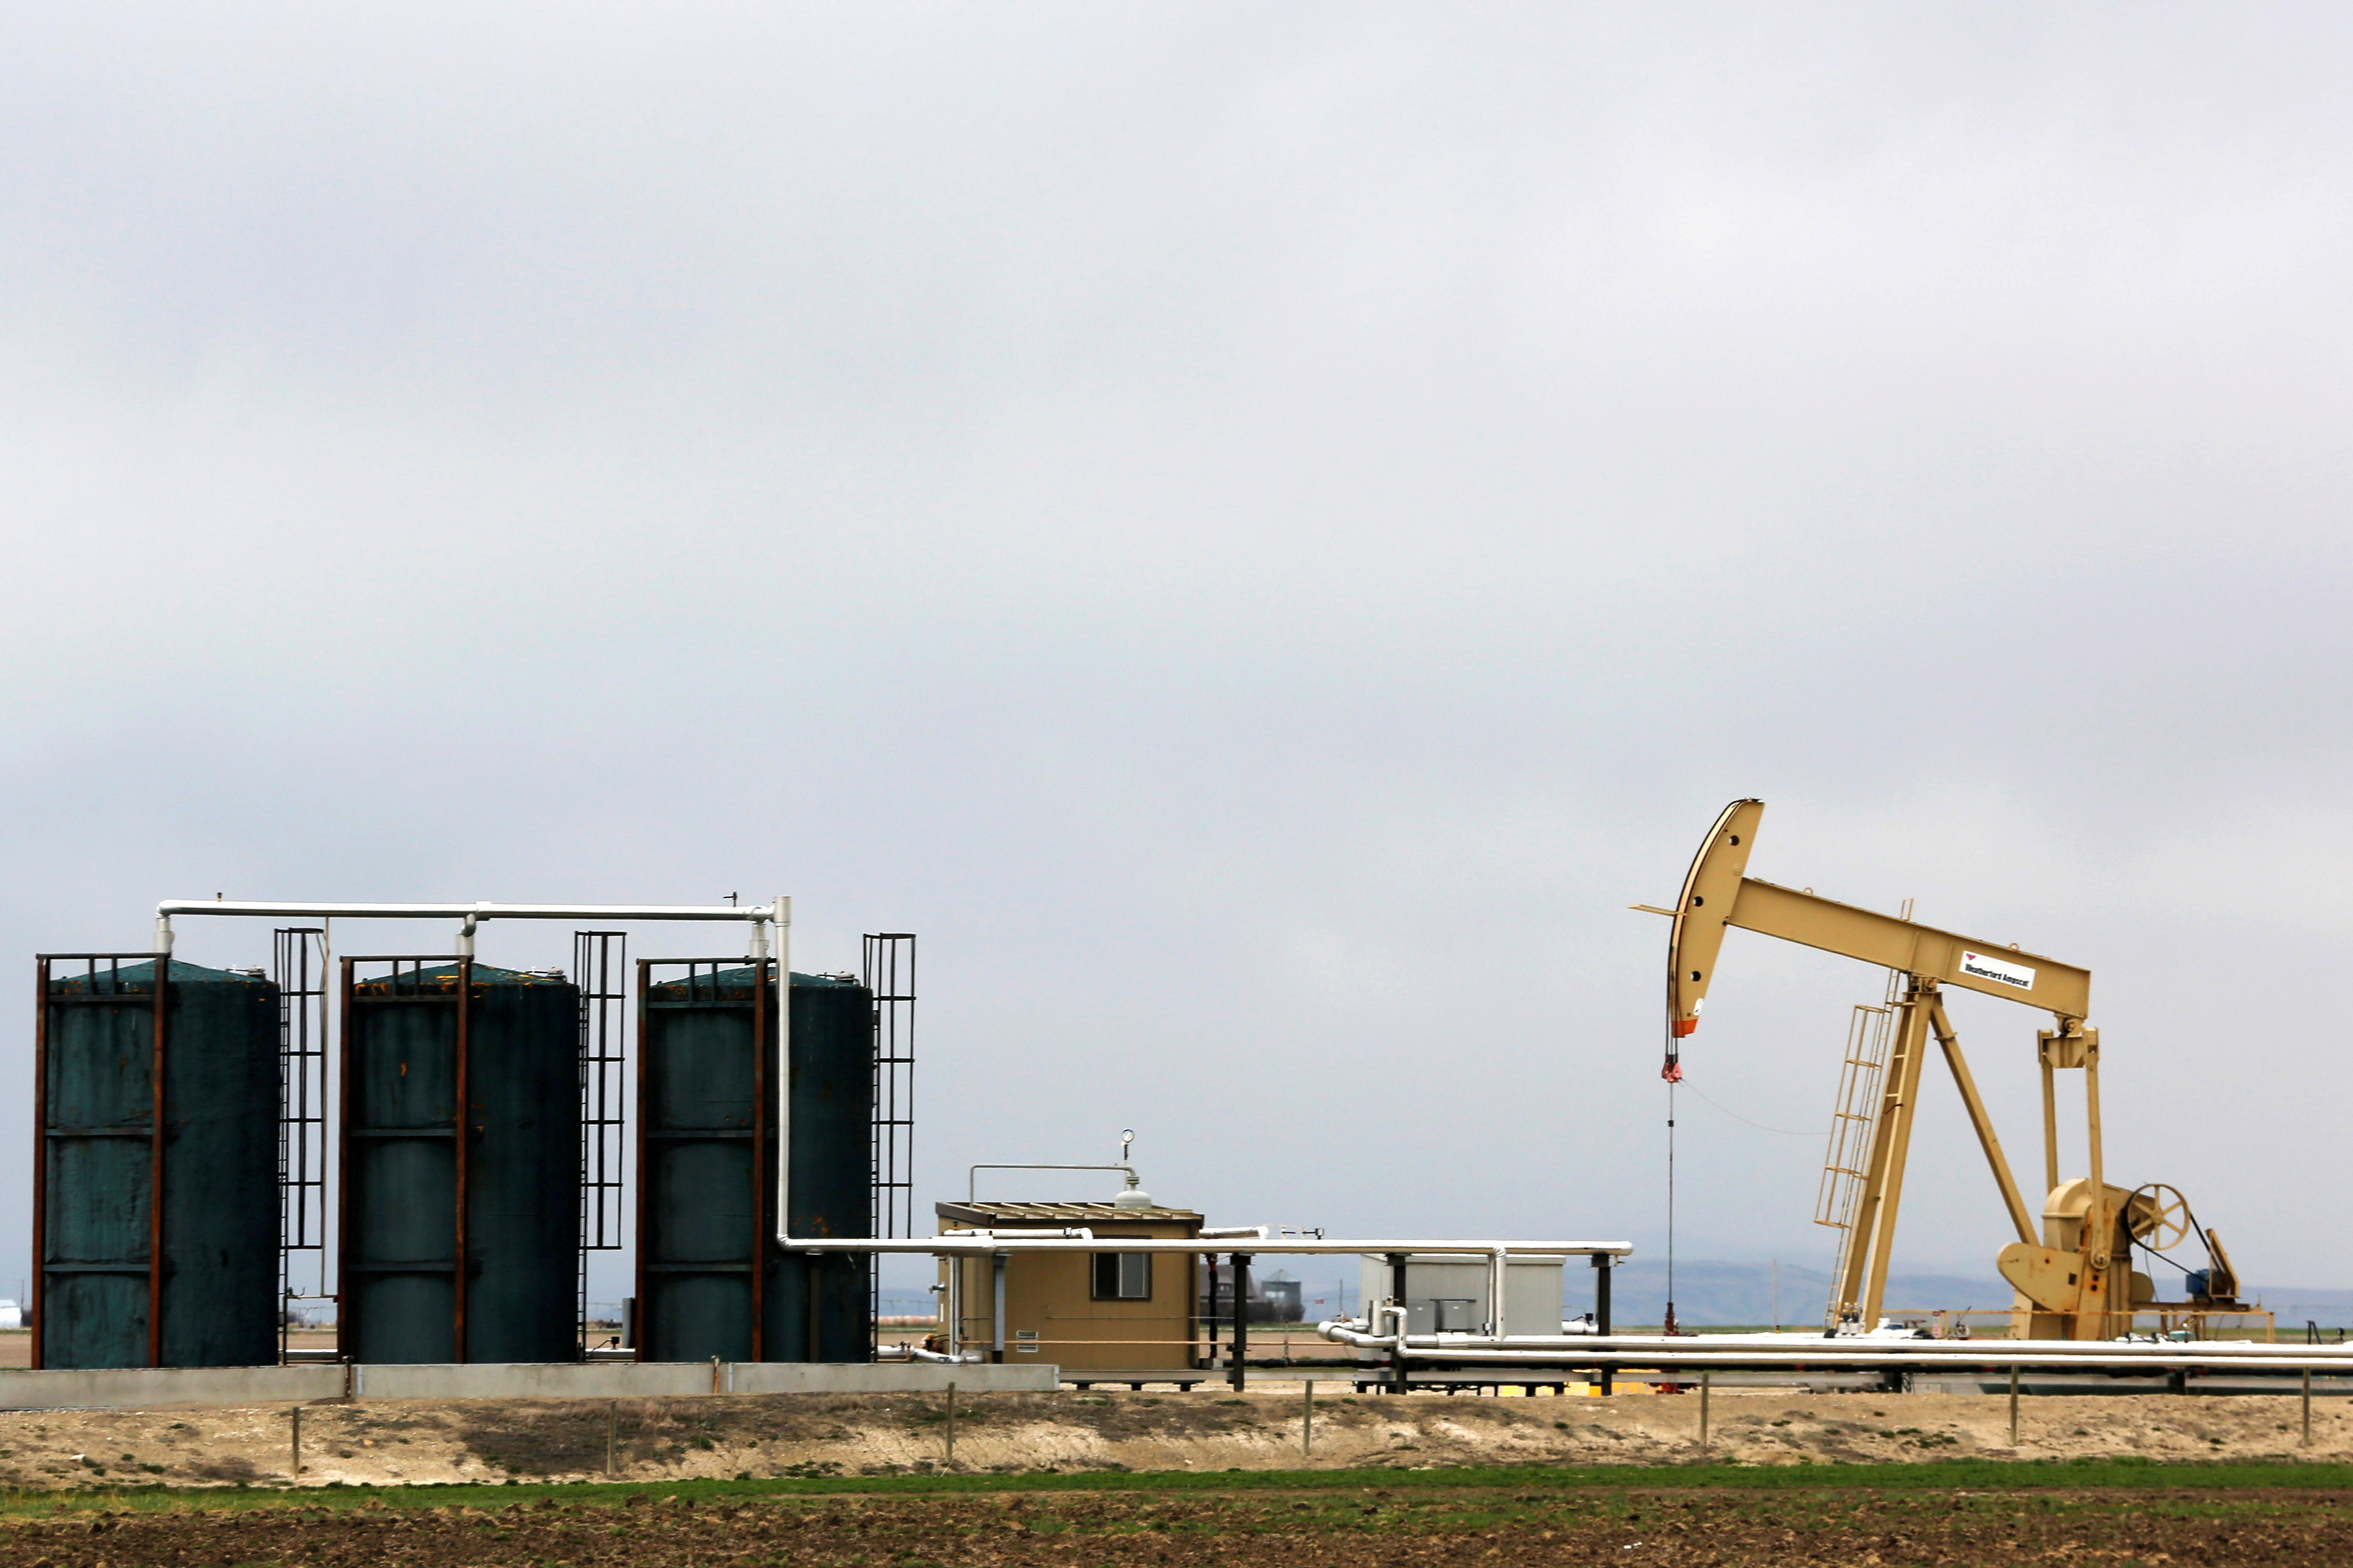 A TORC Oil & Gas pump jack is seen near Granum, Alberta, Canada May 6, 2020. REUTERS/Todd Korol/File Photo